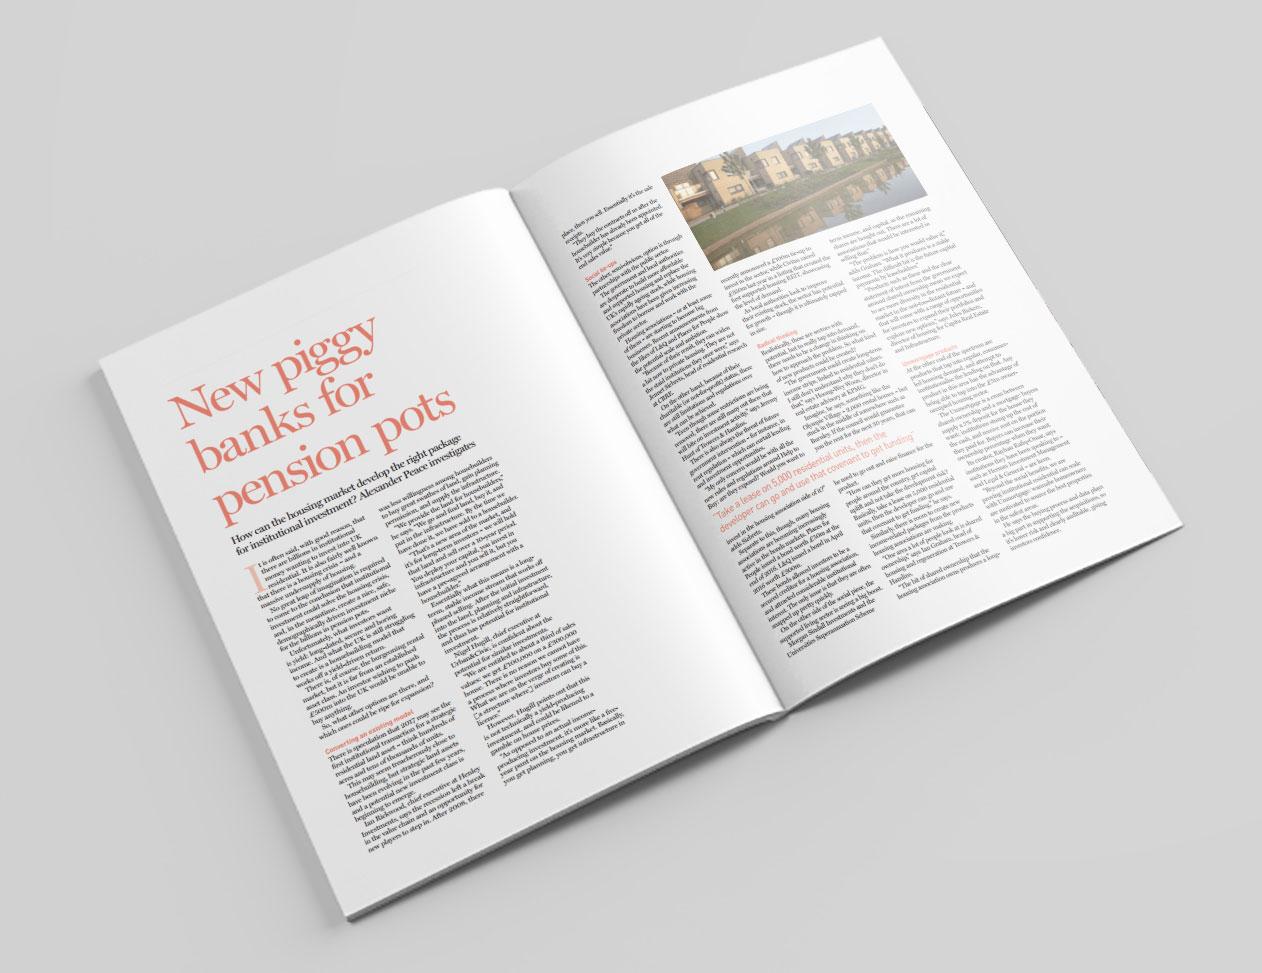 Henley Article in the March 2017 Publication of Estates Gazette